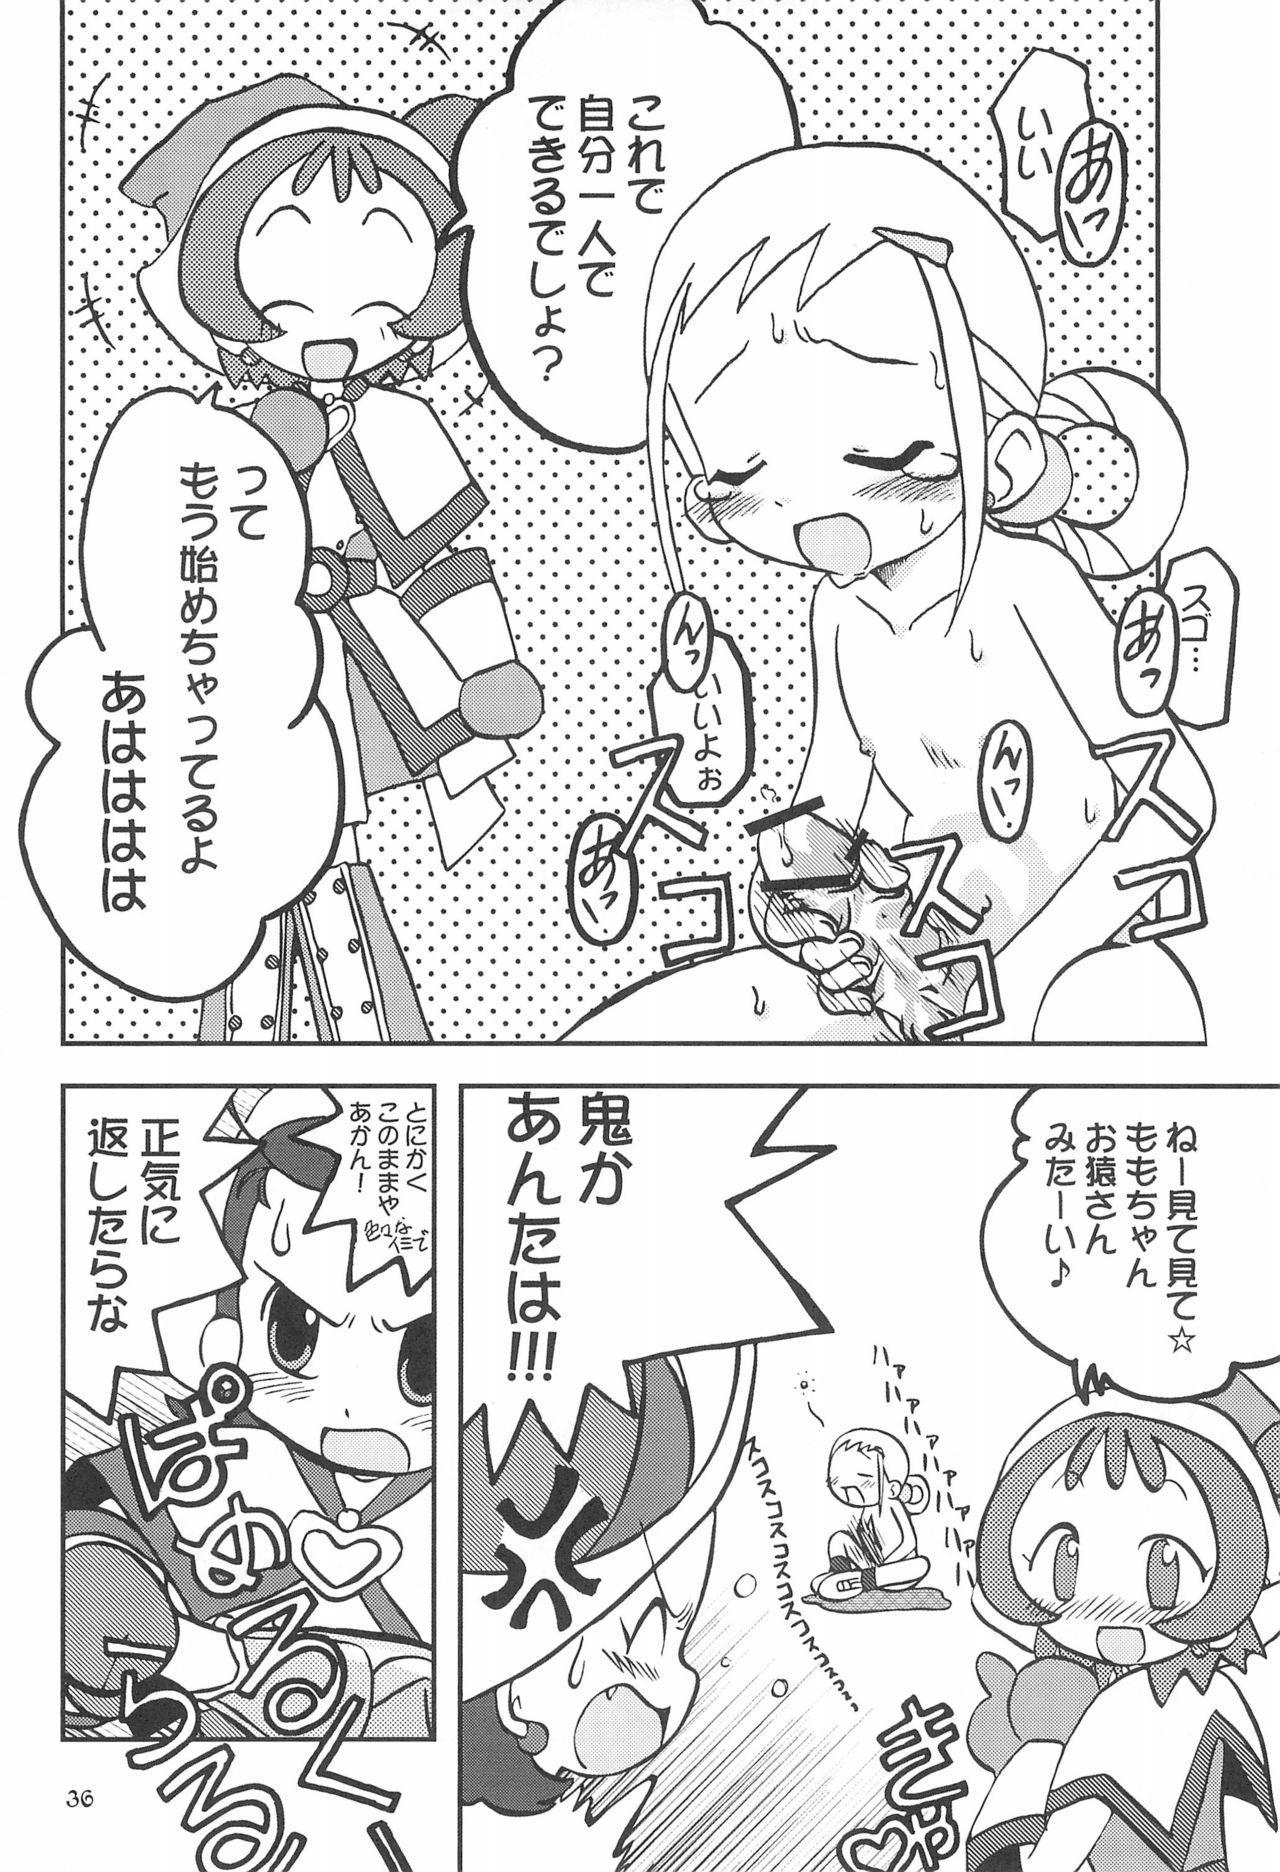 Momo no Kanzume 35